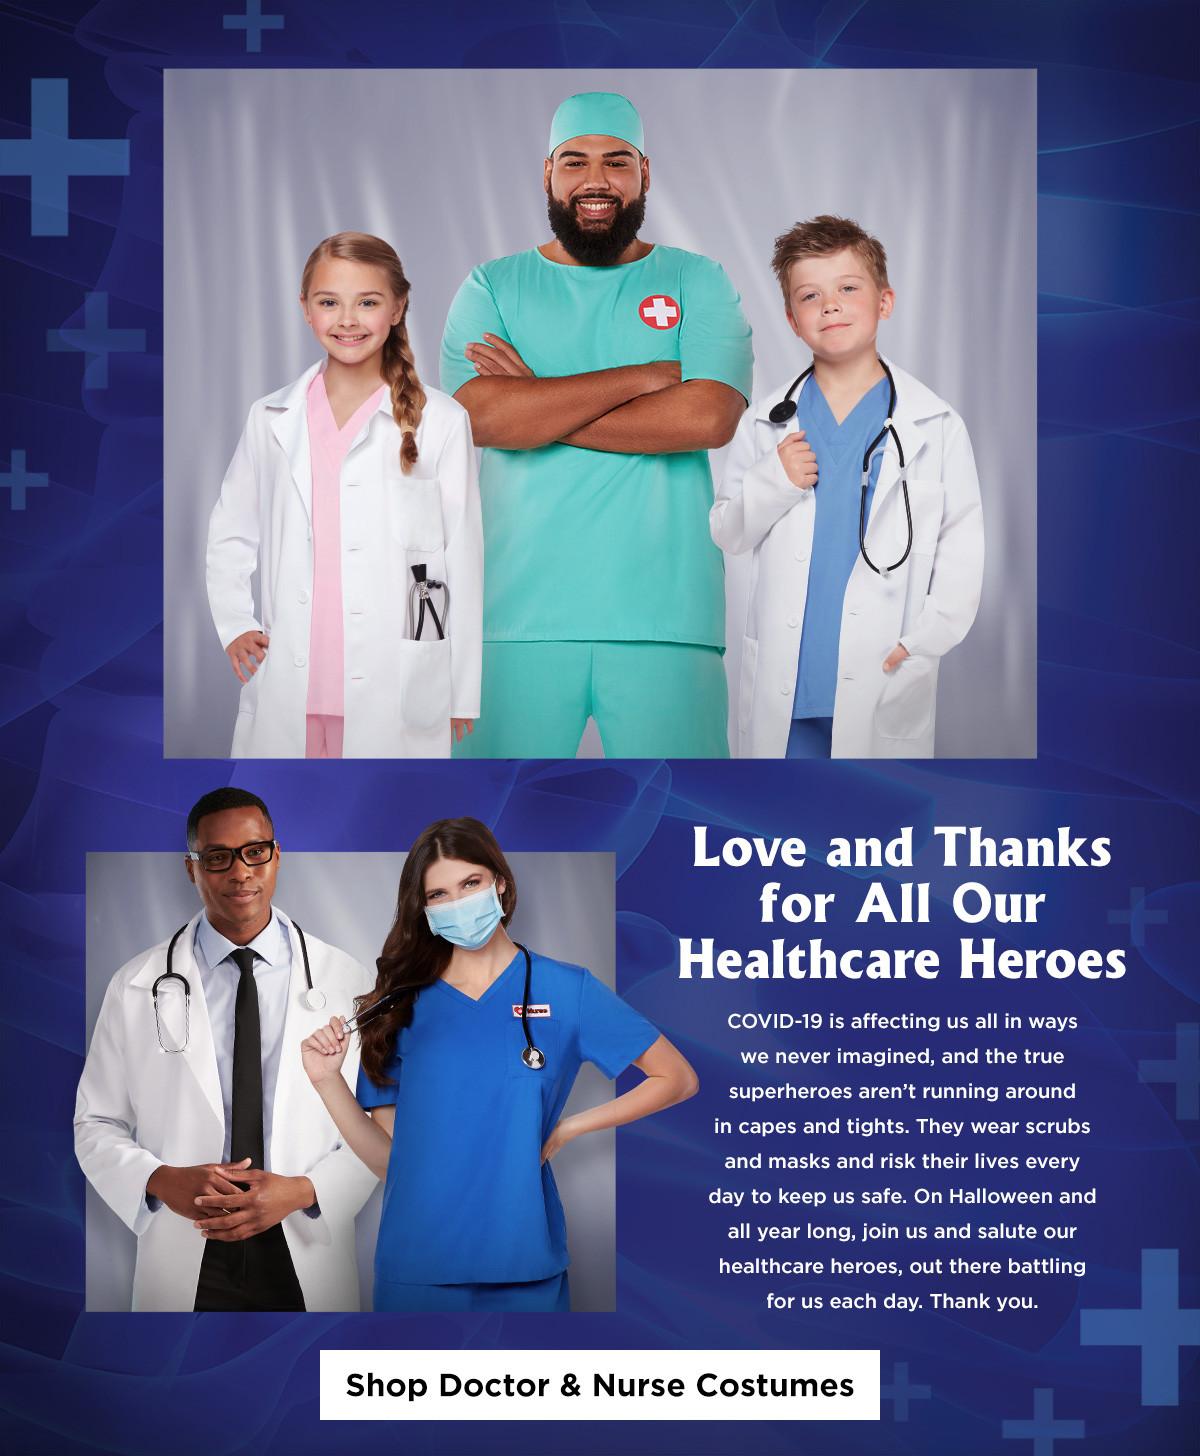 Health Care Nurse and Doctor